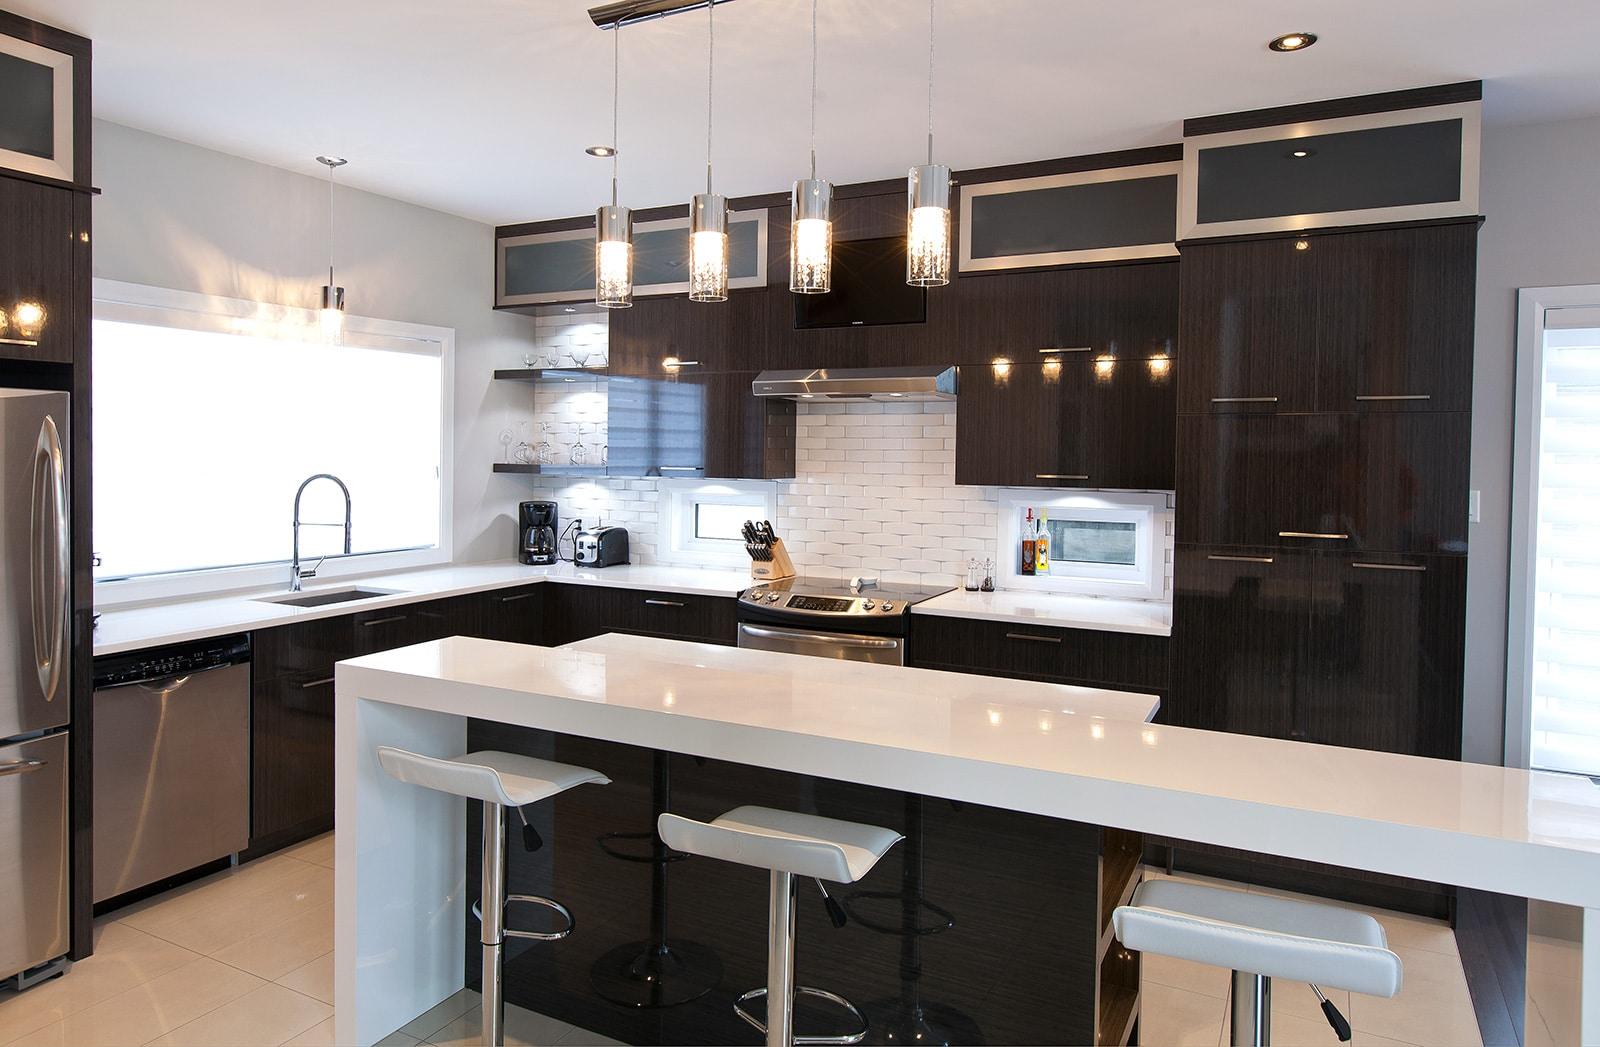 photos de cuisine moderne. Black Bedroom Furniture Sets. Home Design Ideas